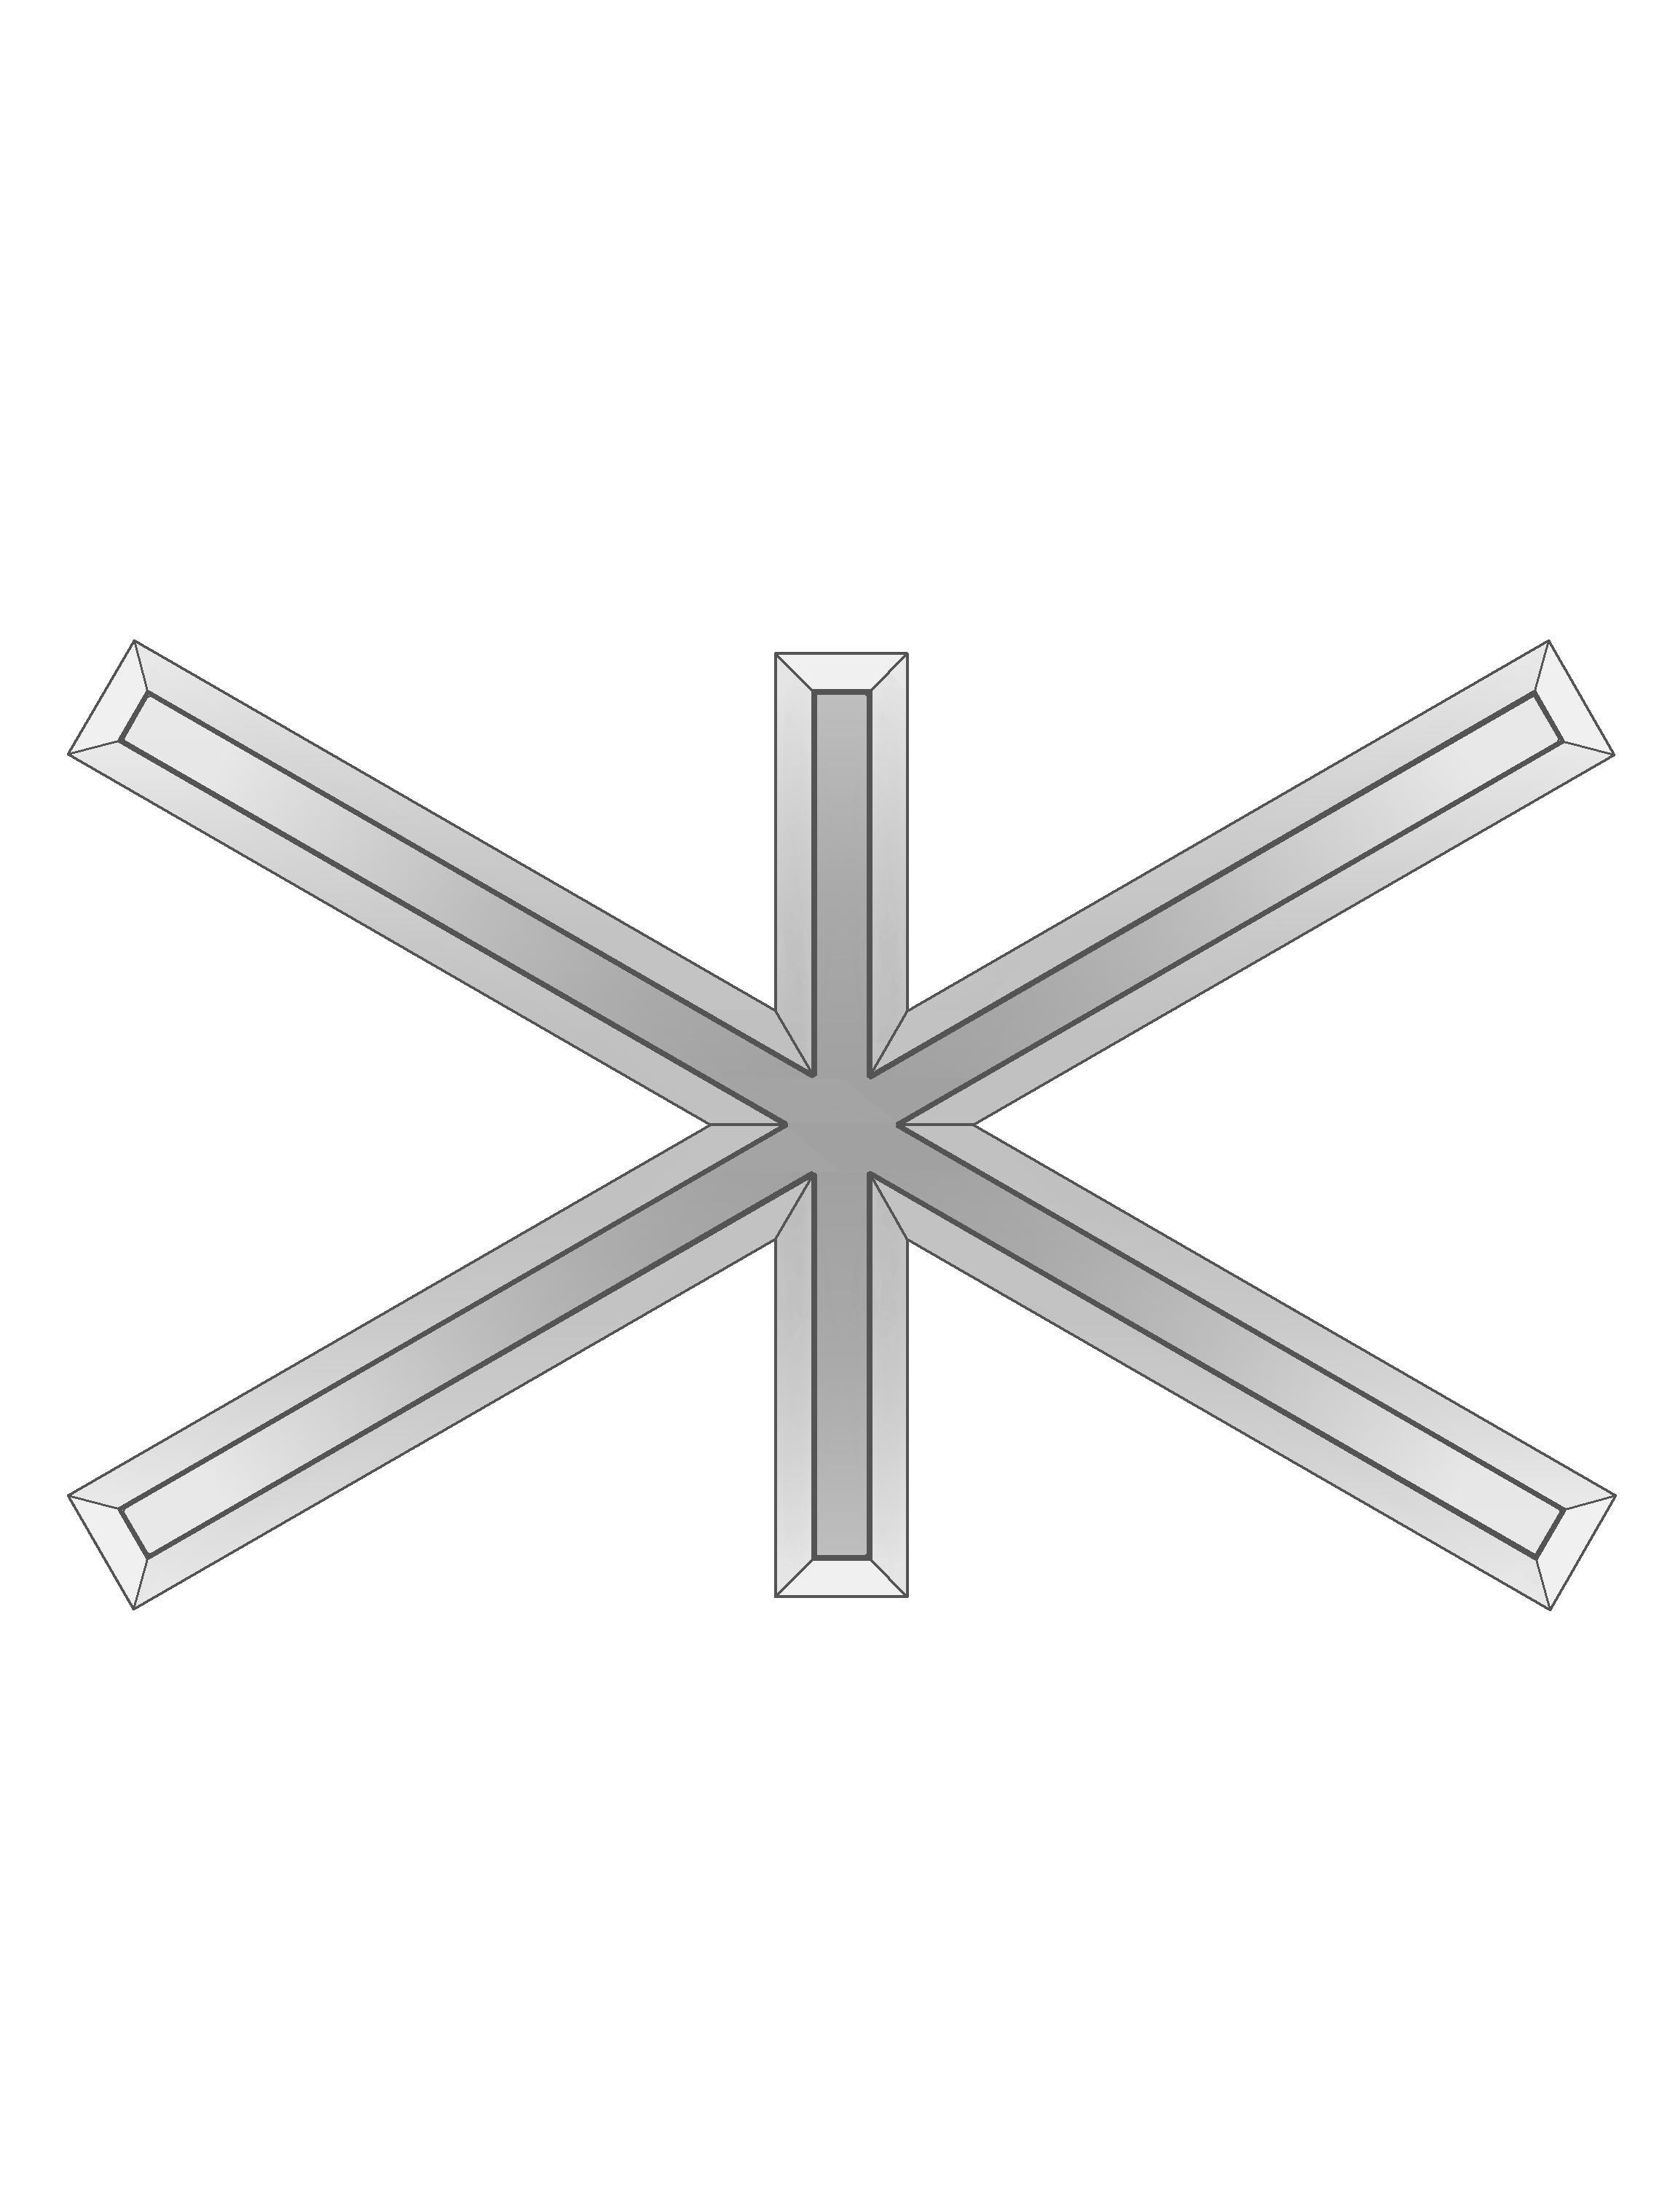 Нужен логотип (эмблема) для самодельного квадроцикла фото f_1295afd36195008a.jpg